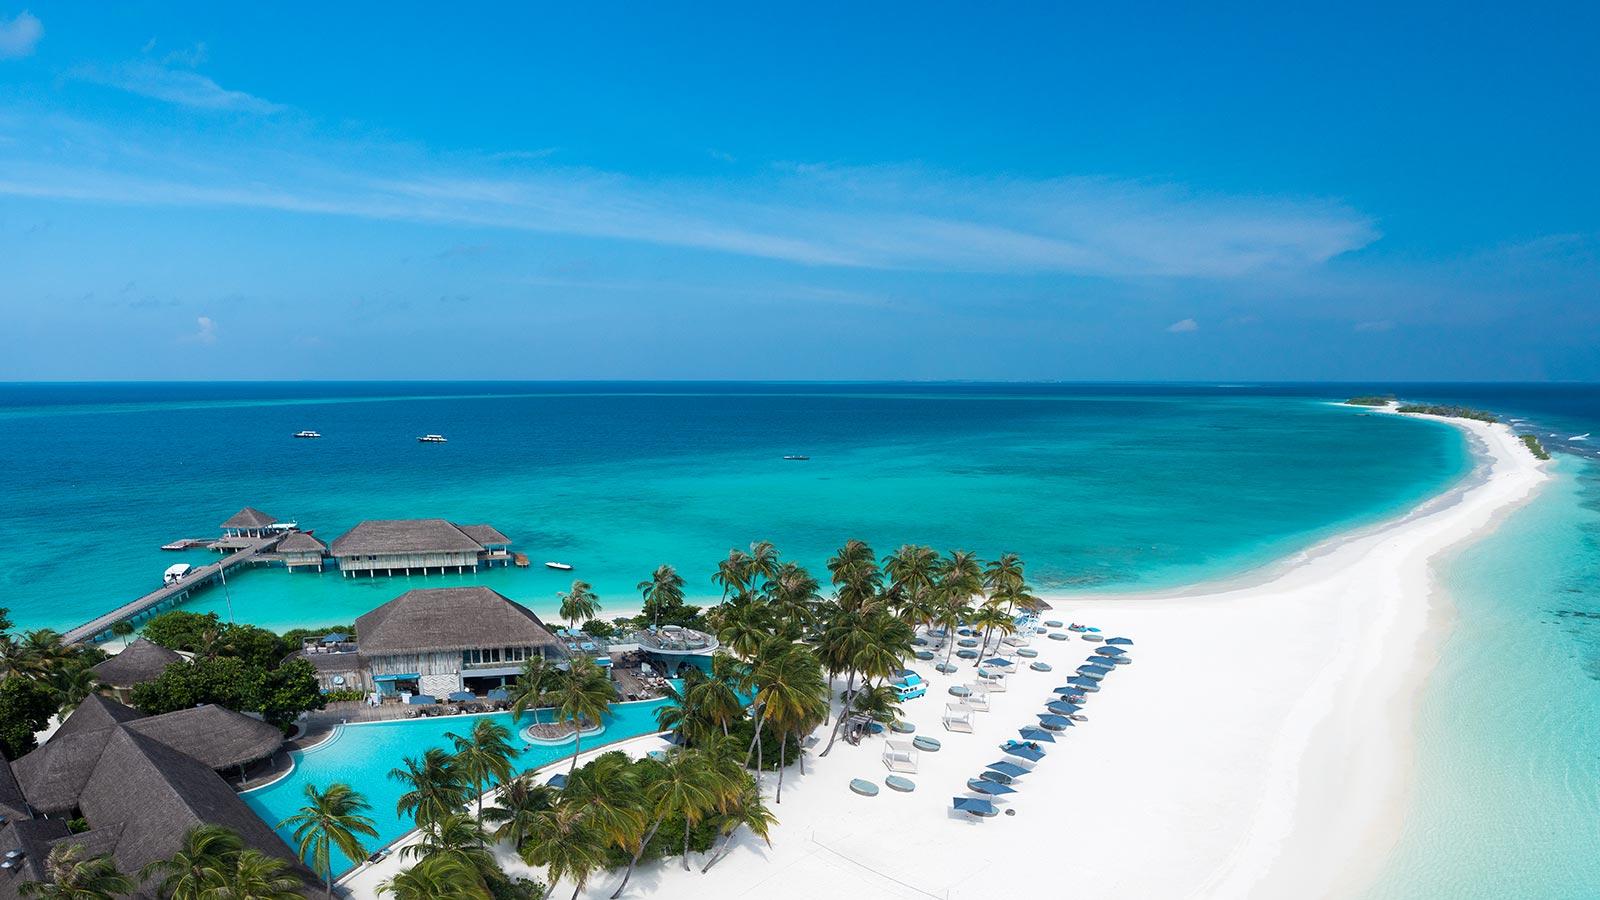 Maldives Luxury Beach Resort